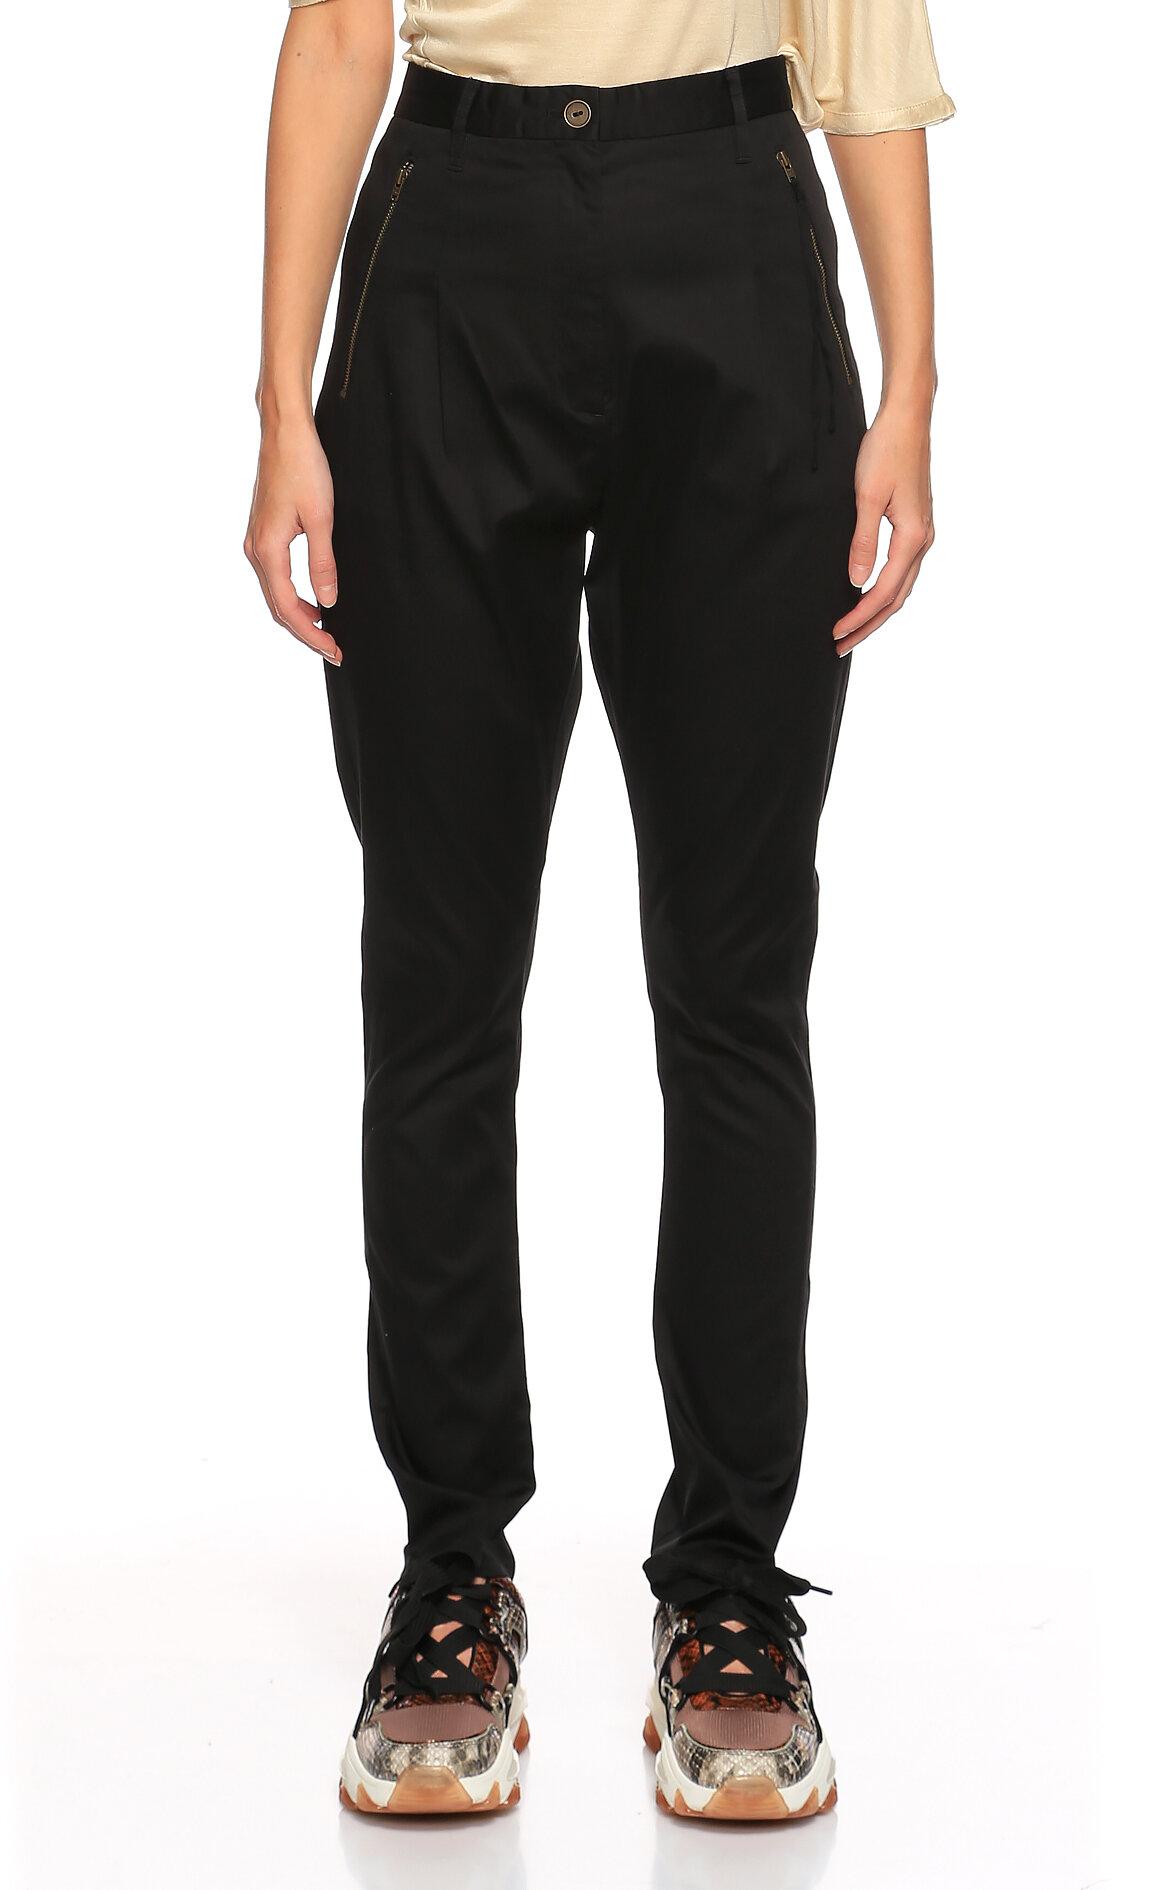 Acne Studios-Acne Studios Şalvar Model Siyah Pantolon